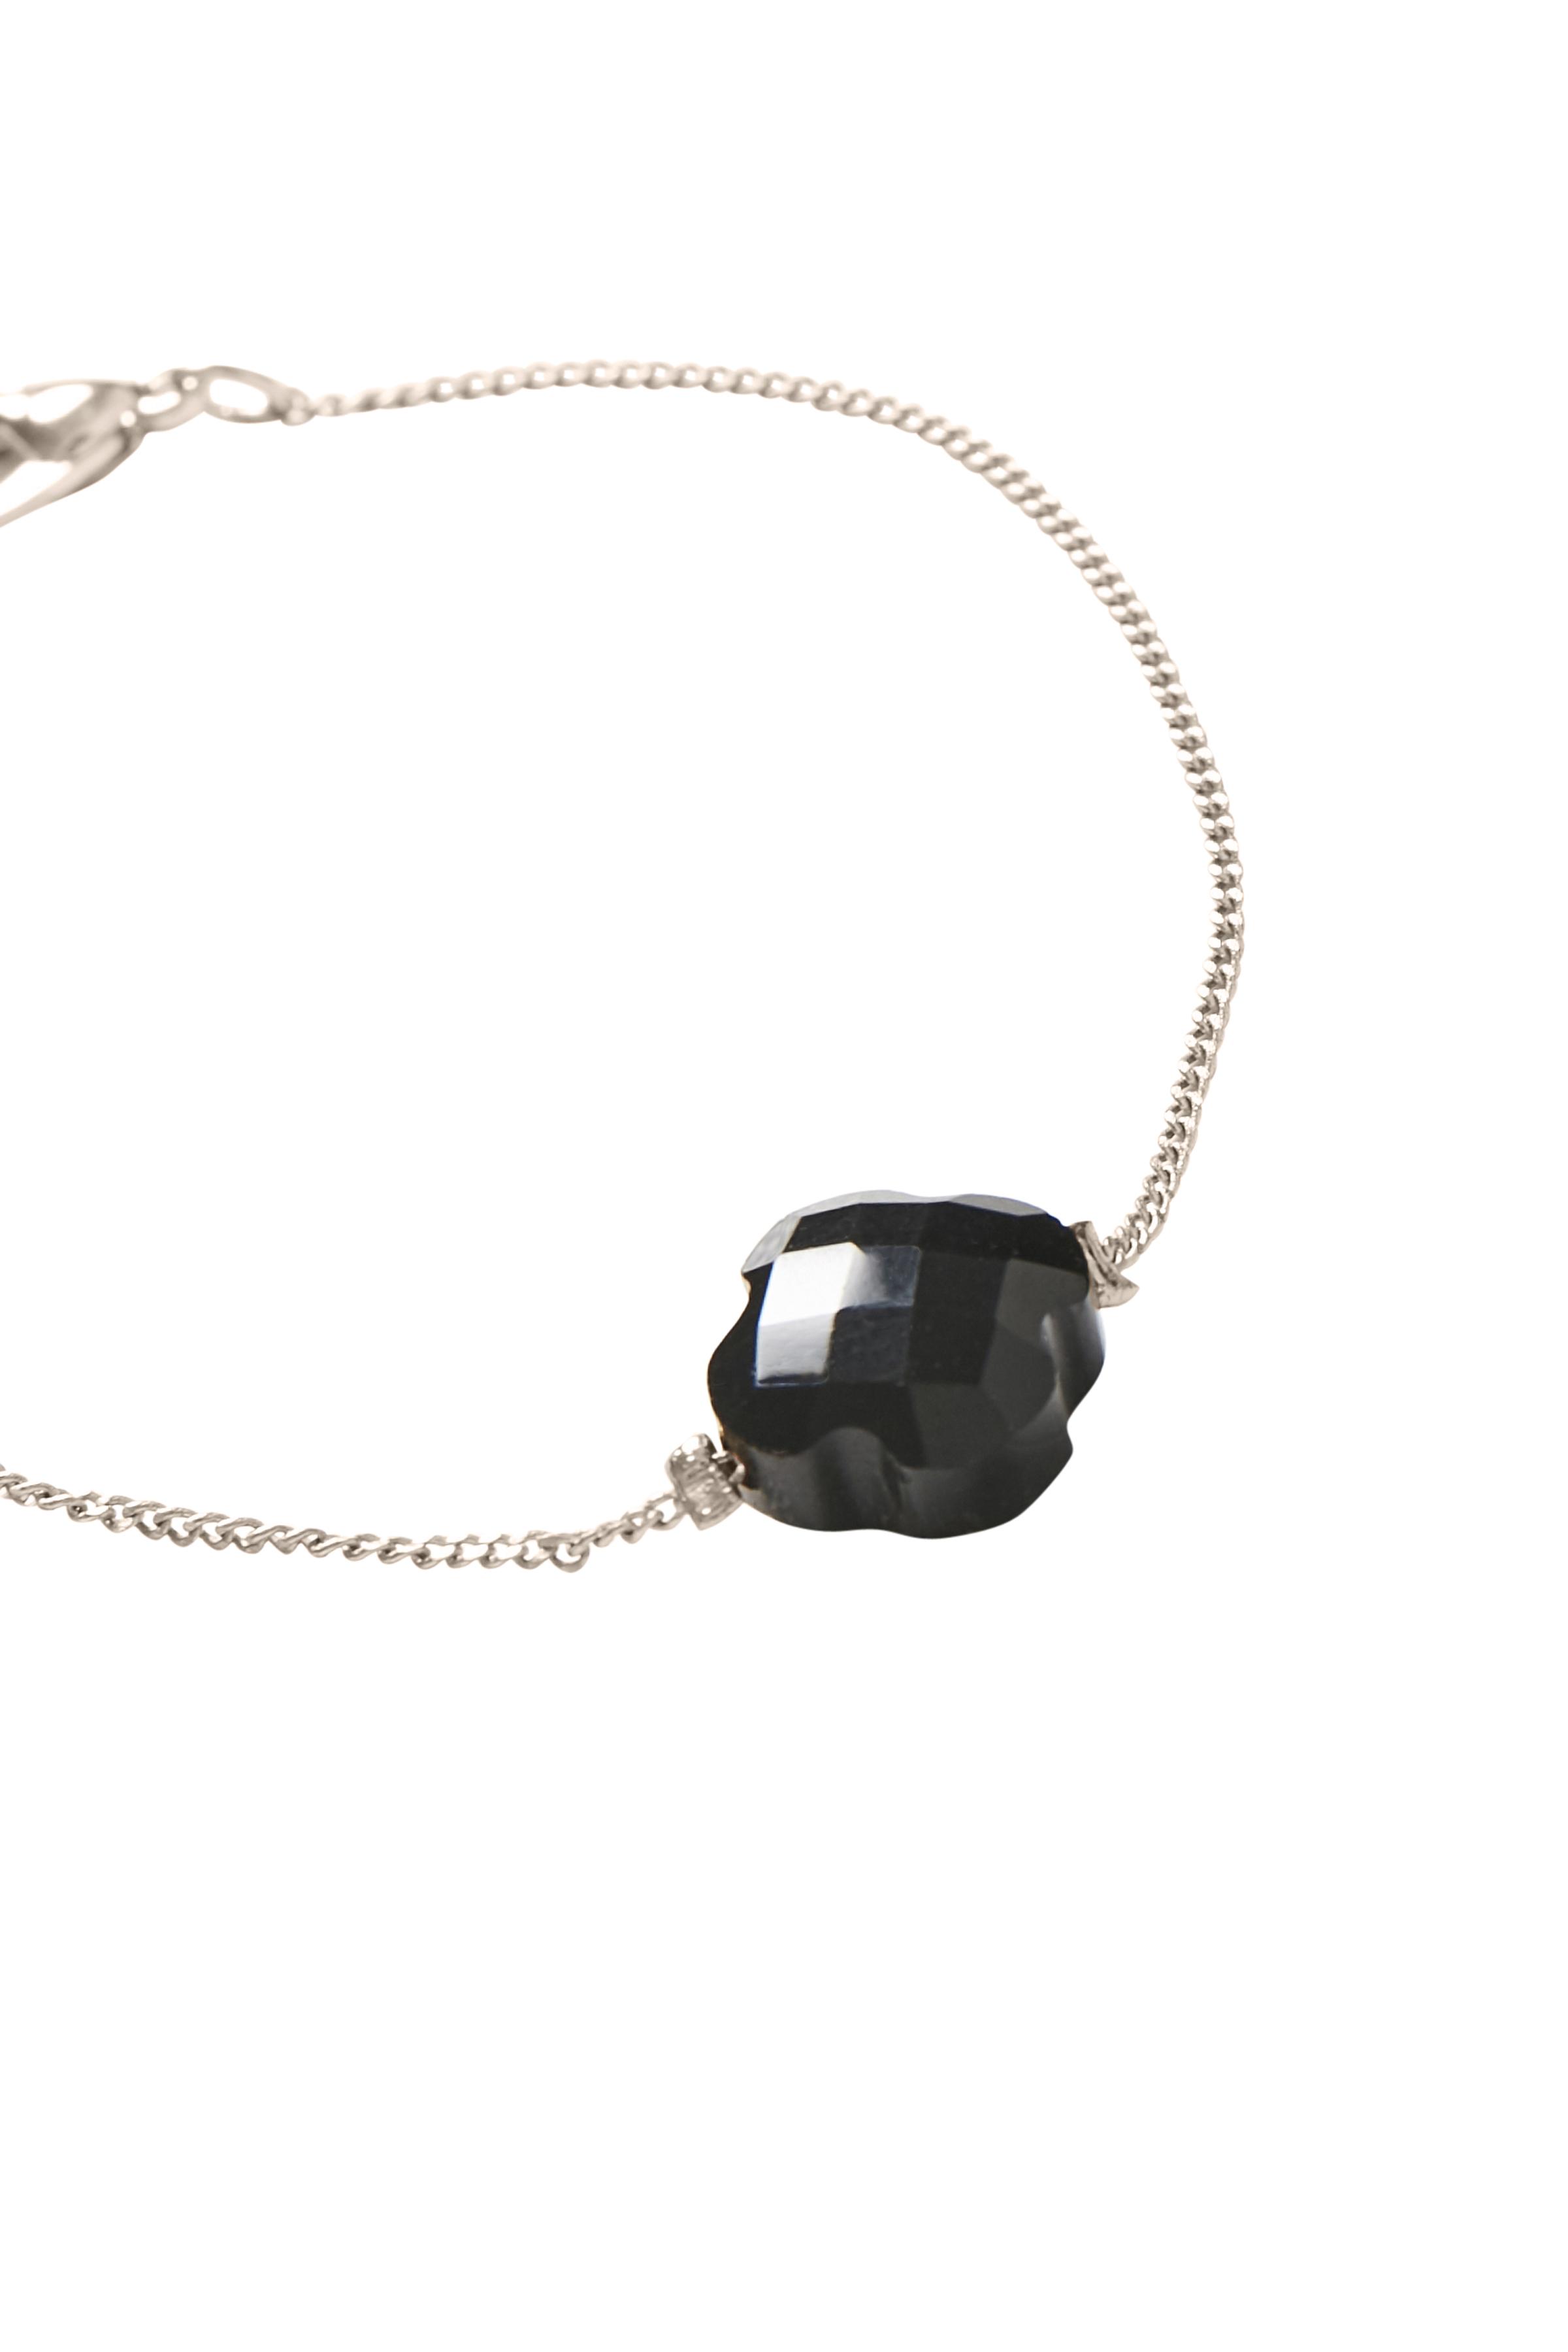 Sølv Armbånd  fra Fransa – Køb Sølv Armbånd  fra str. ONE her